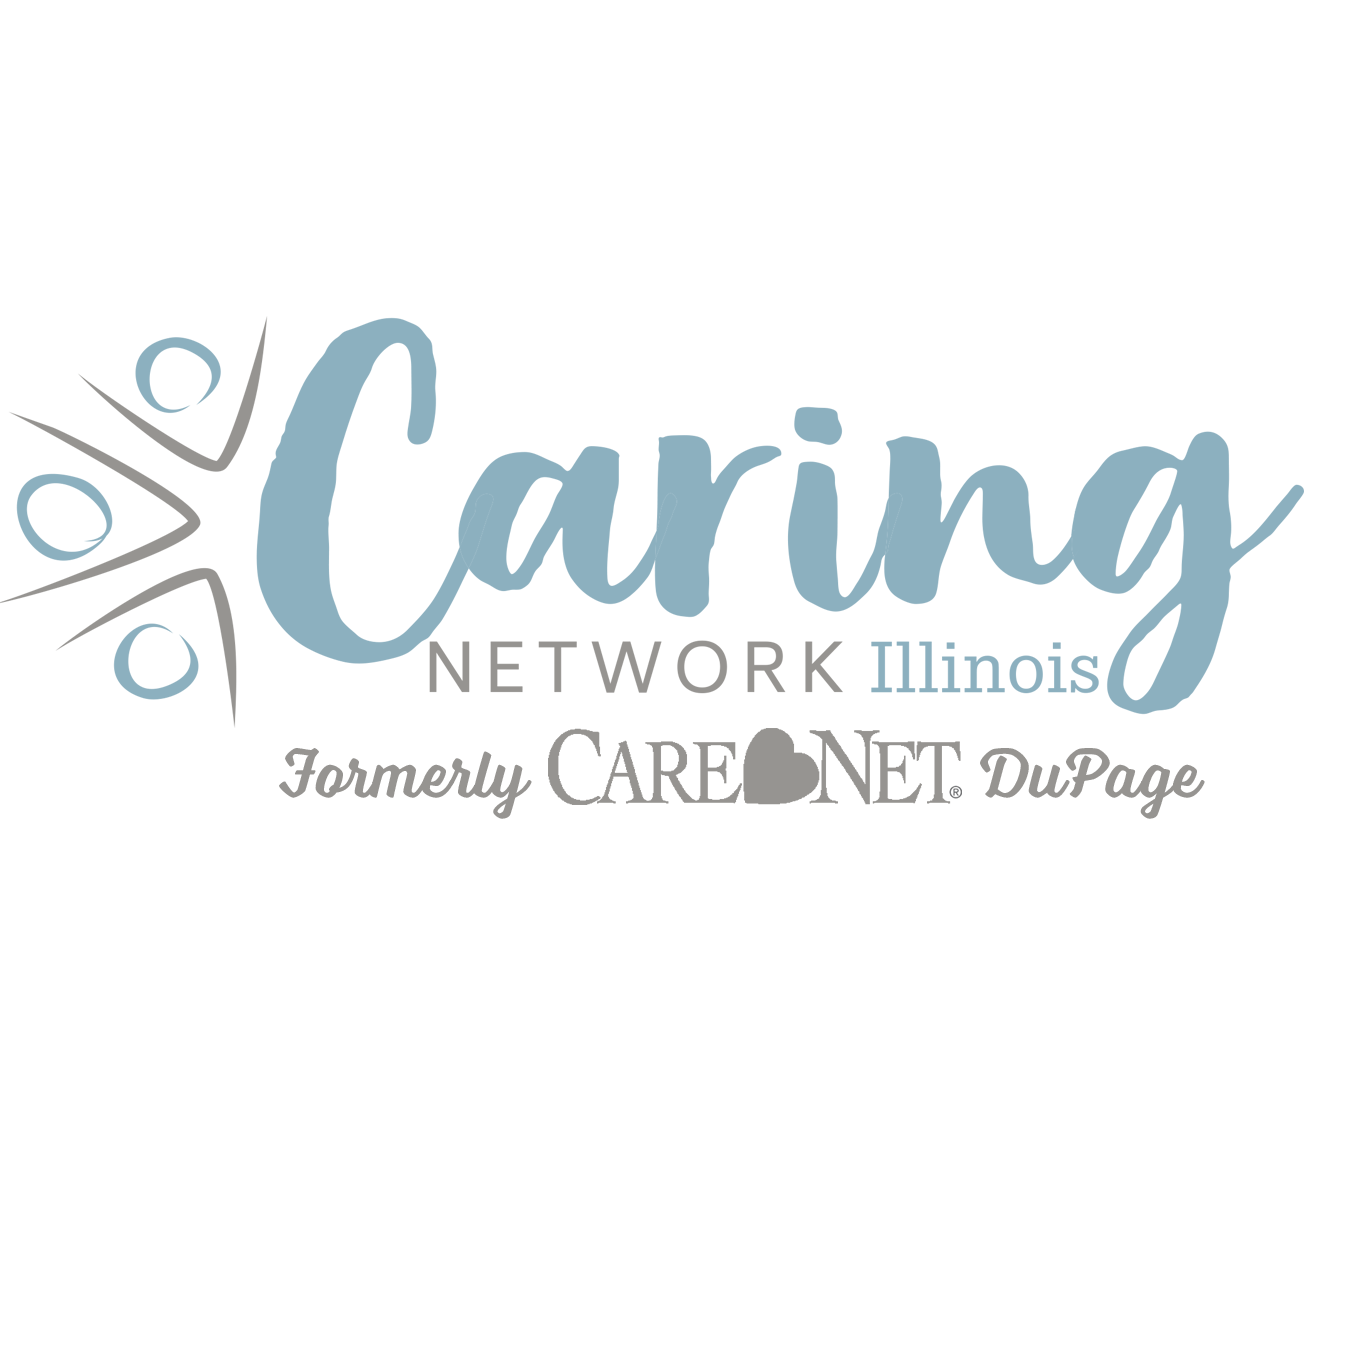 Caring Network Illinois